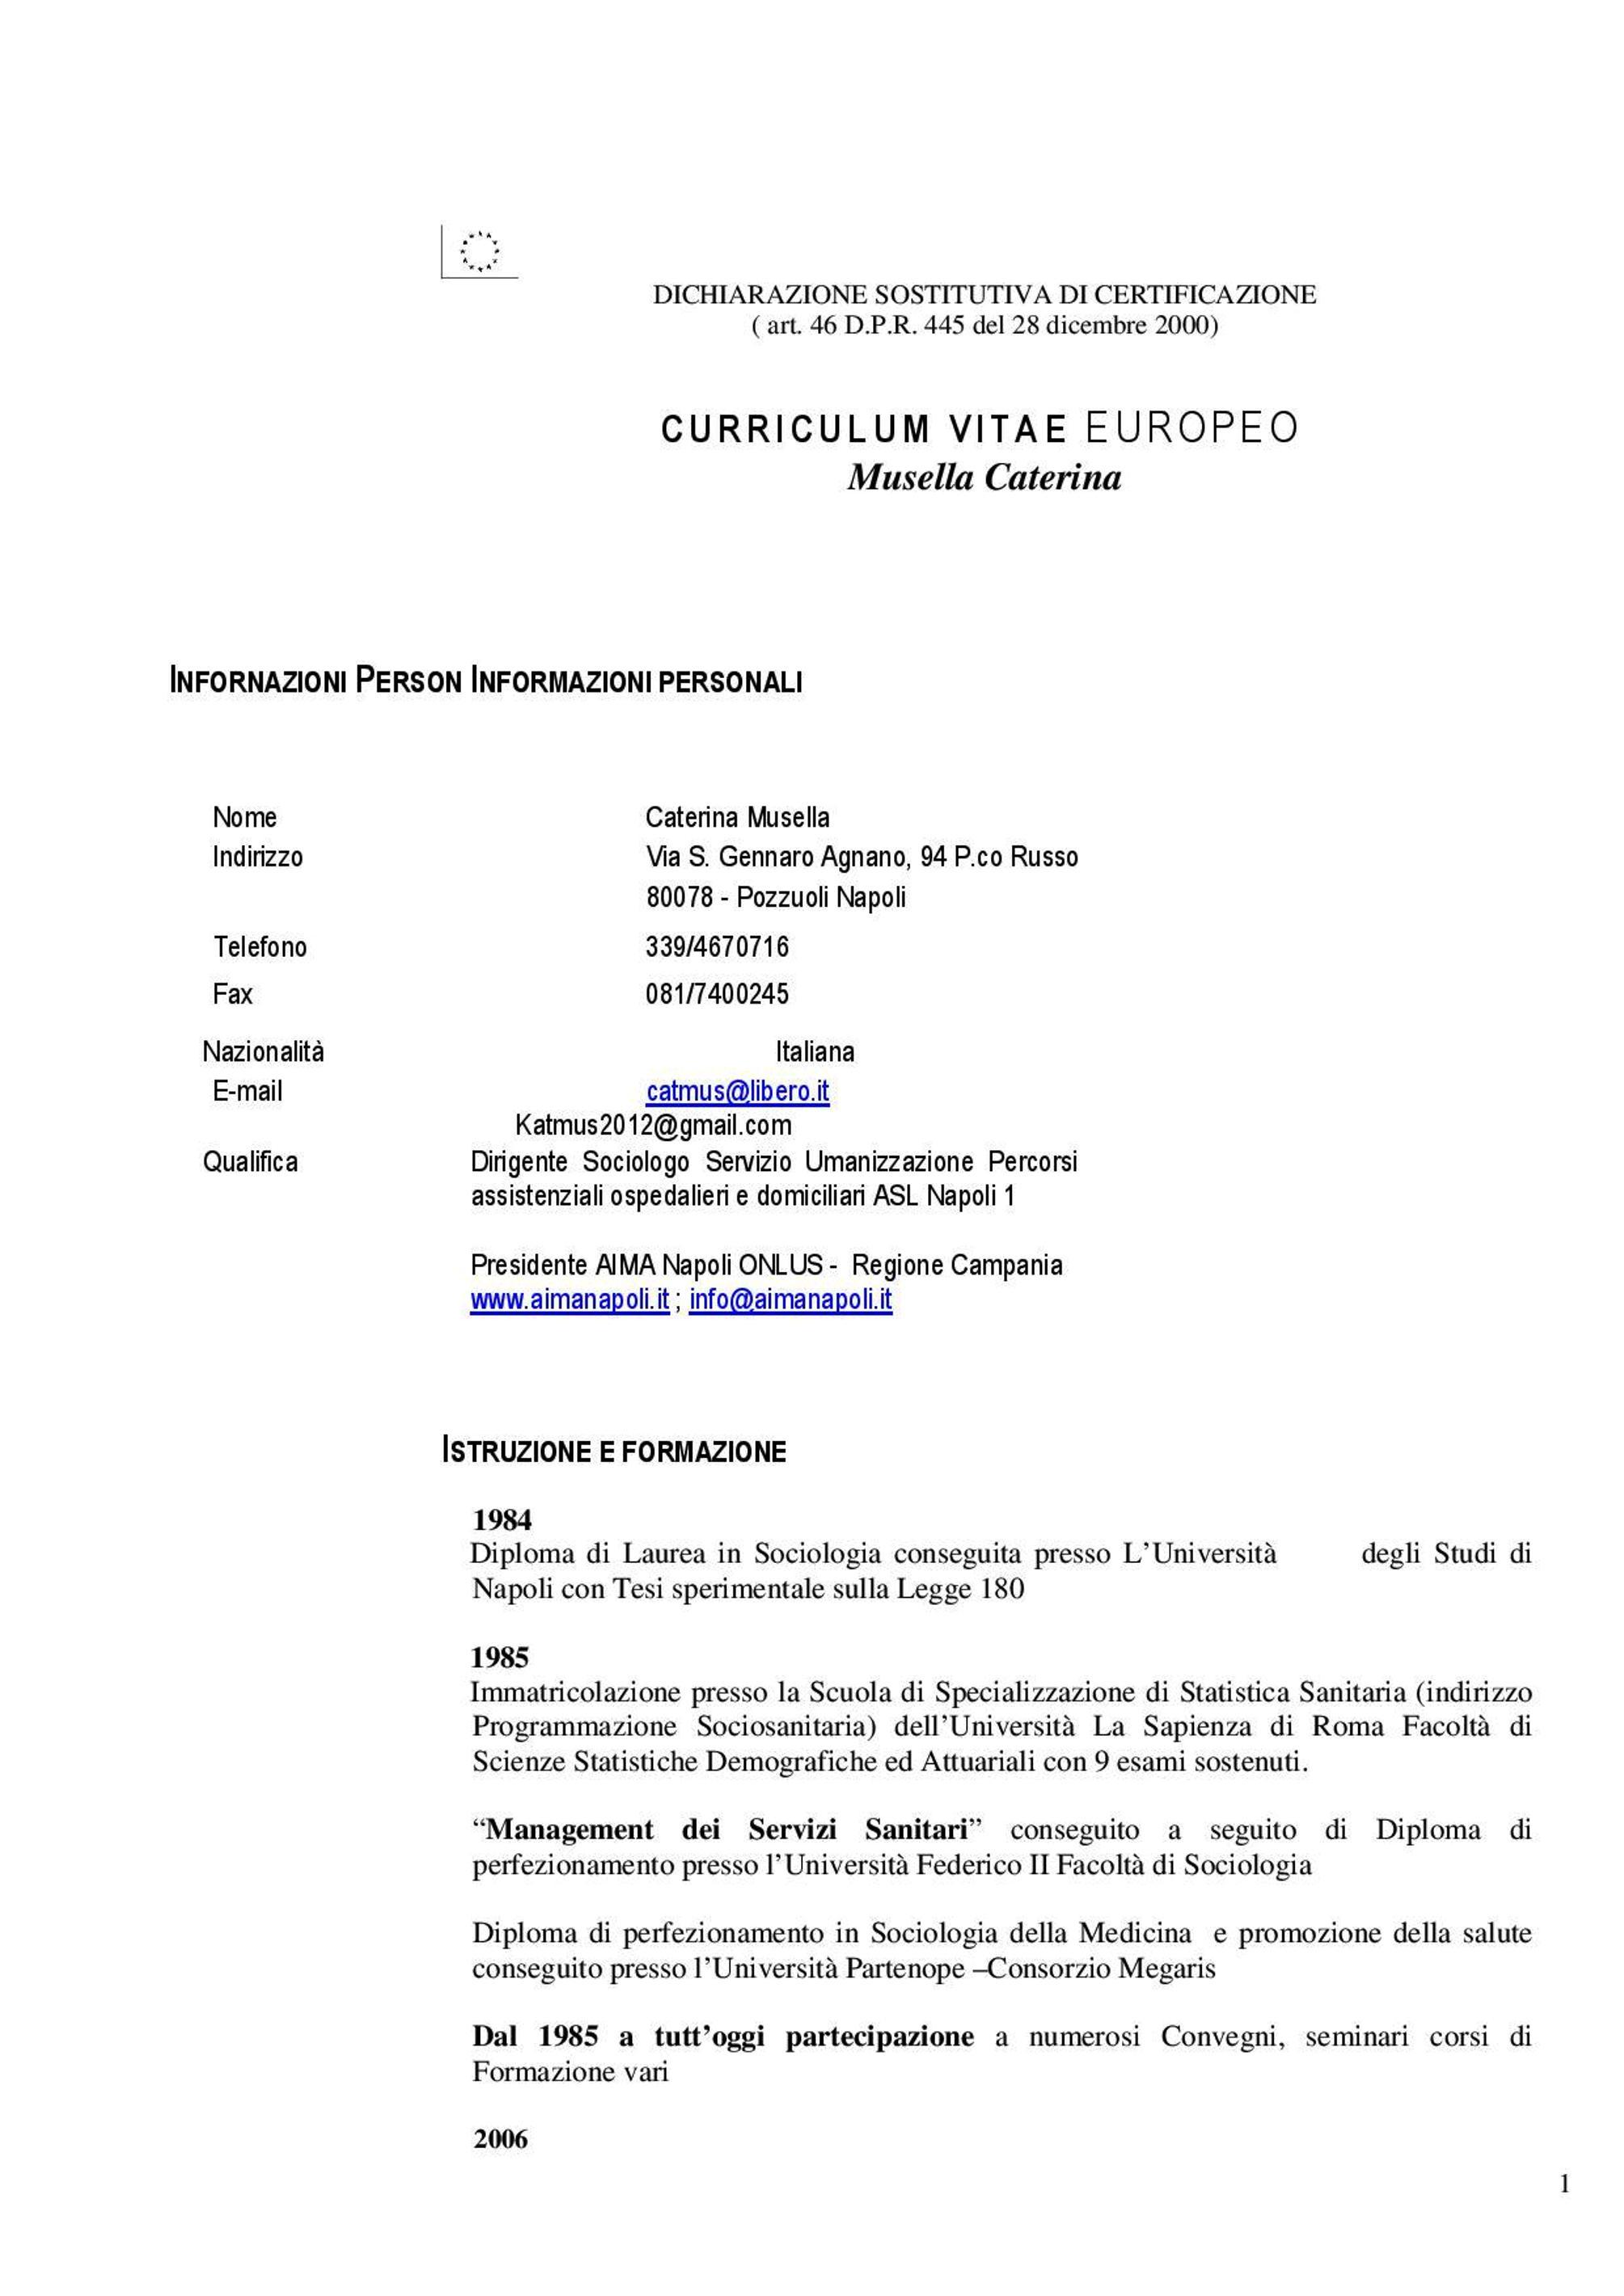 CUURICULUM MUSELLA FORMATO EUROPEO-page-001